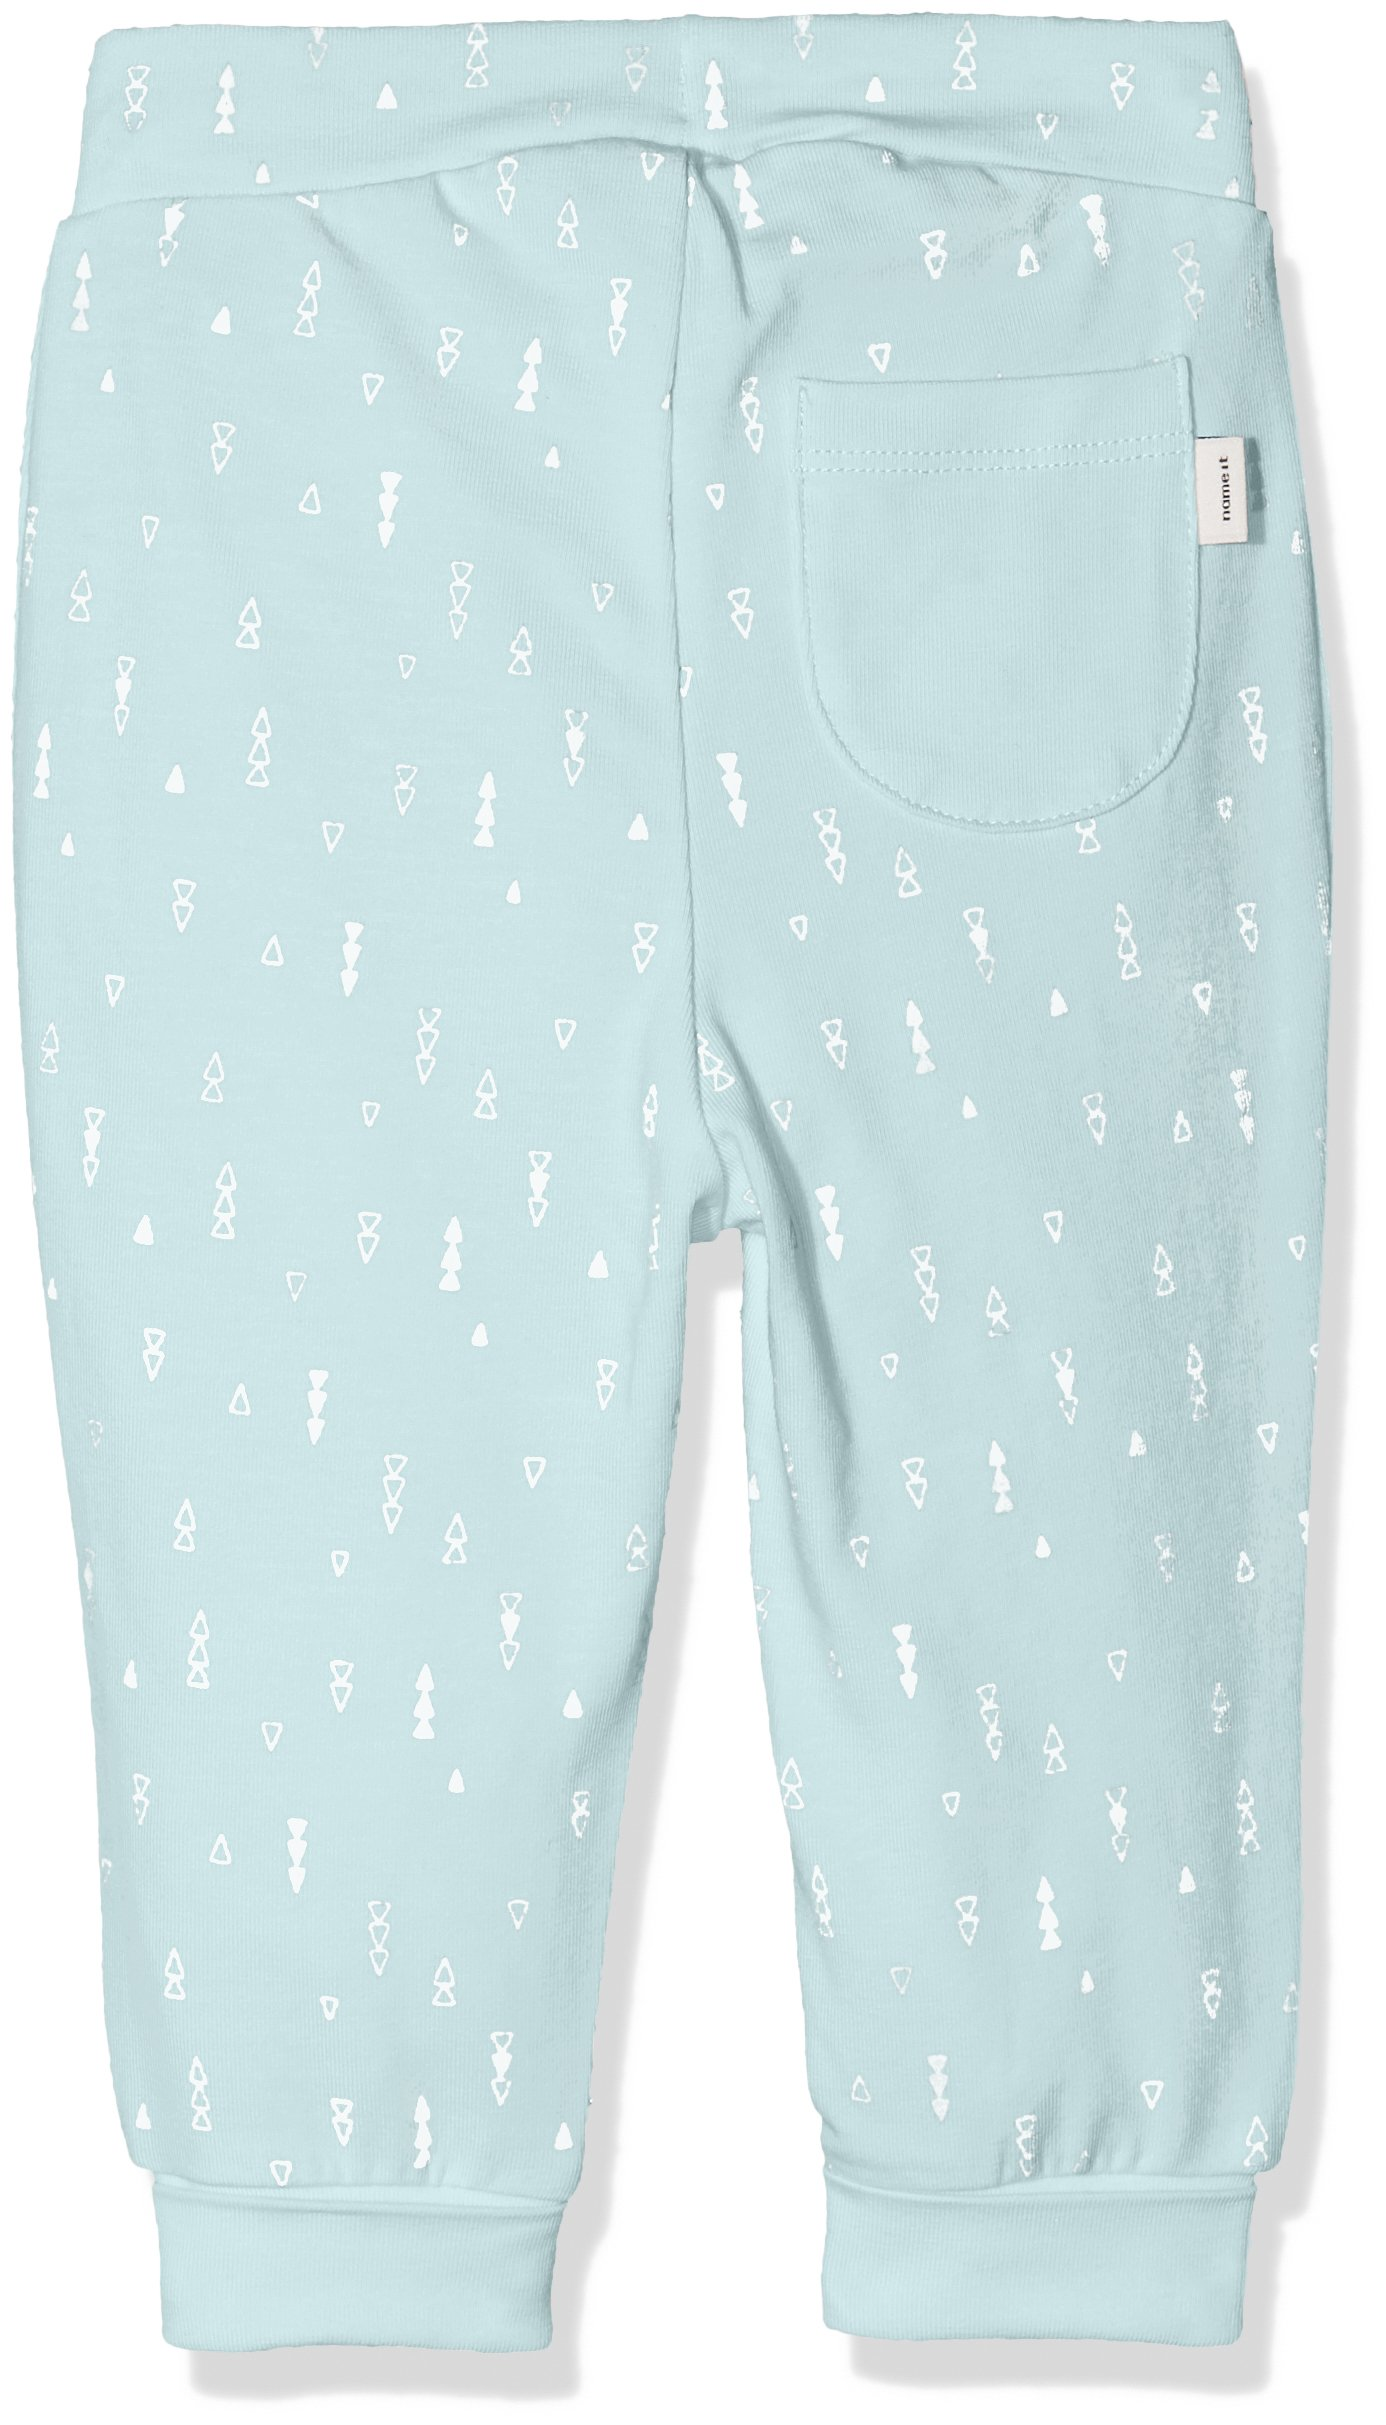 NAME IT Nbndelucious Pant Noos Pantalones para Bebés 2